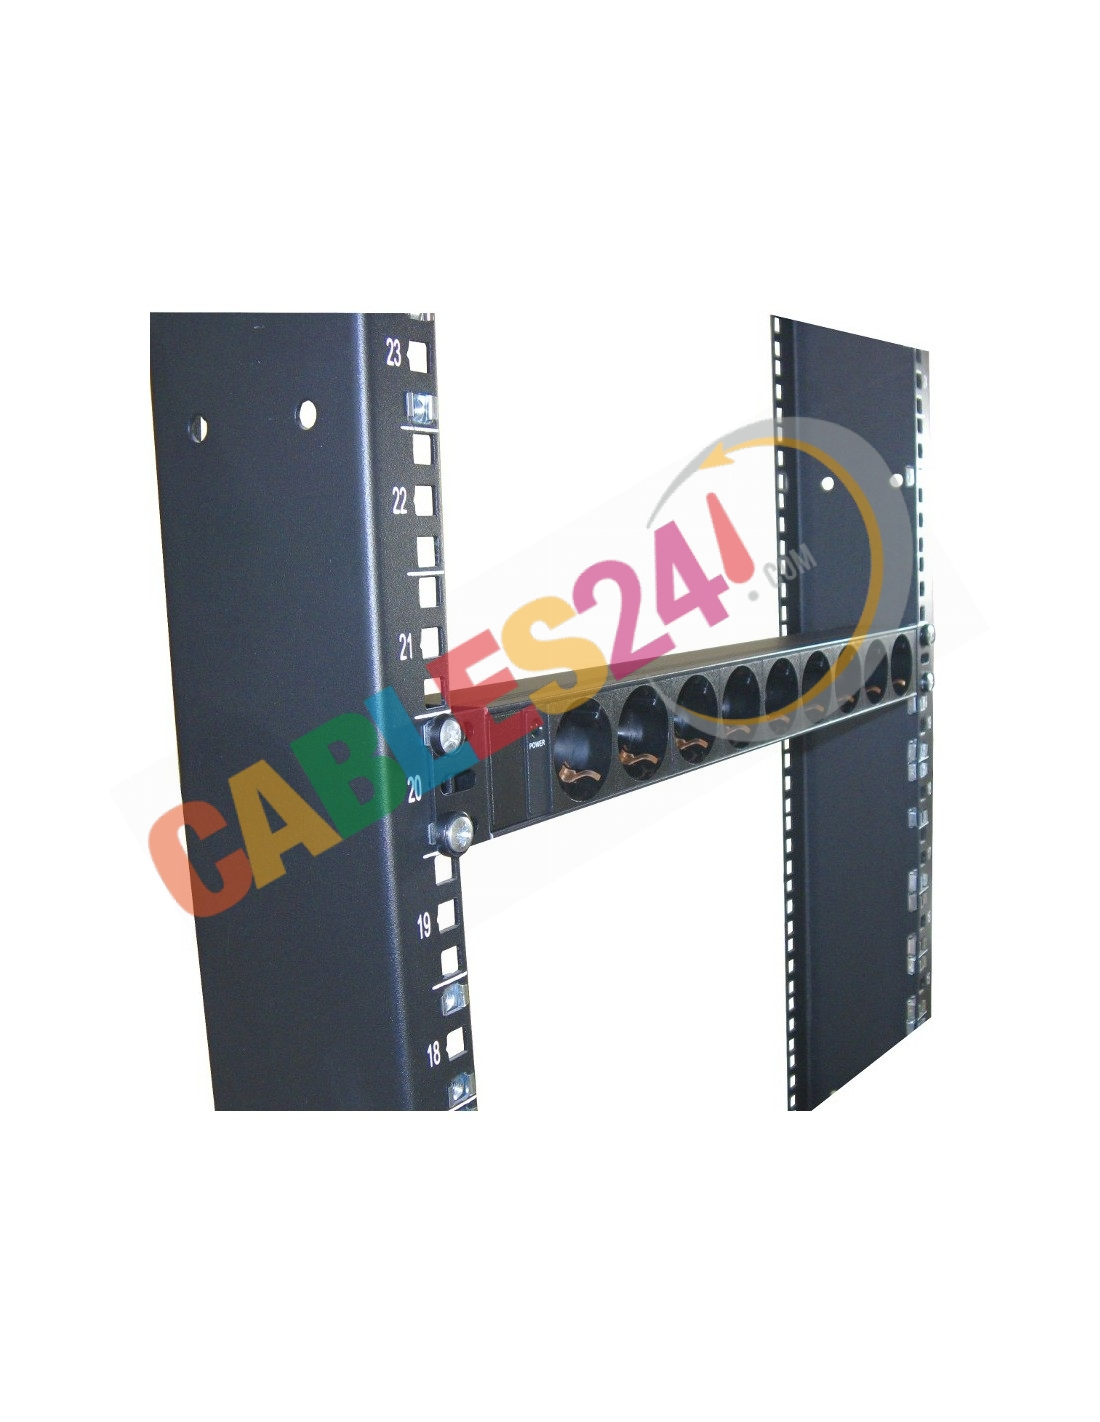 Power Strip Rack 19 inches 9x socket female no switch